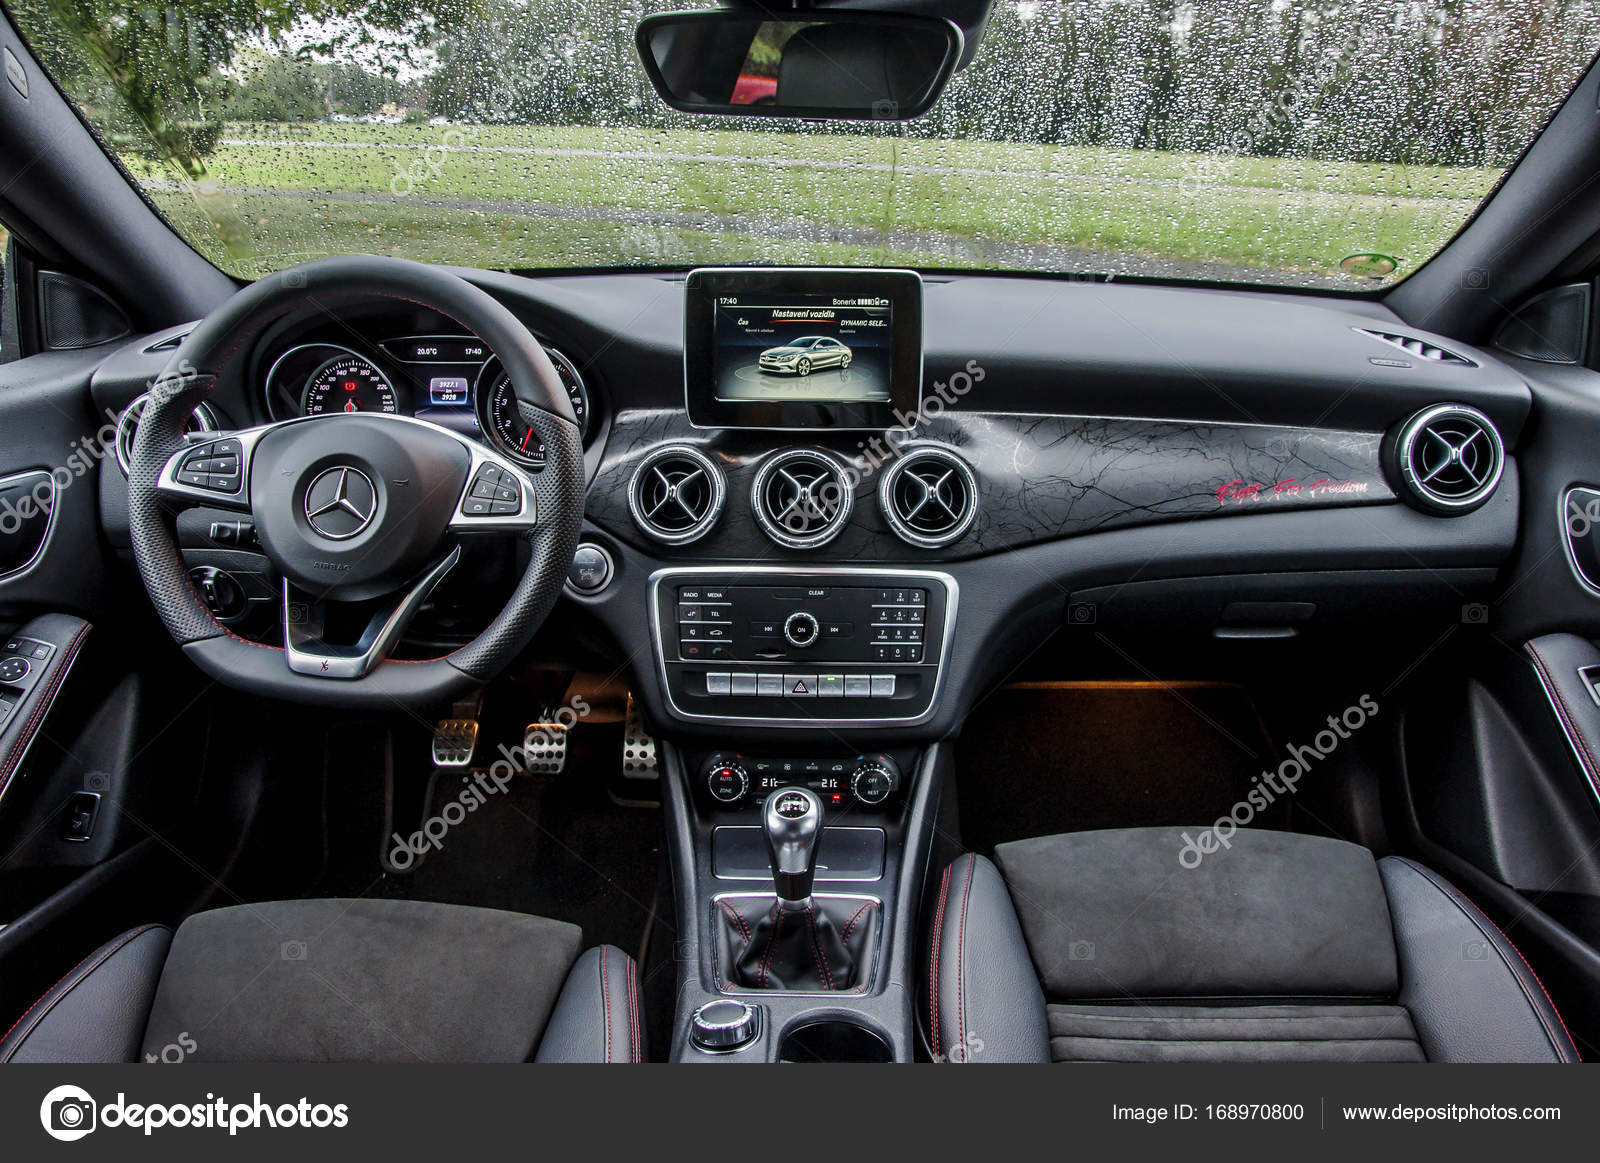 https://st3.depositphotos.com/3009117/16897/i/1600/depositphotos_168970800-stock-photo-luxury-car-interior-of-mercedes.jpg